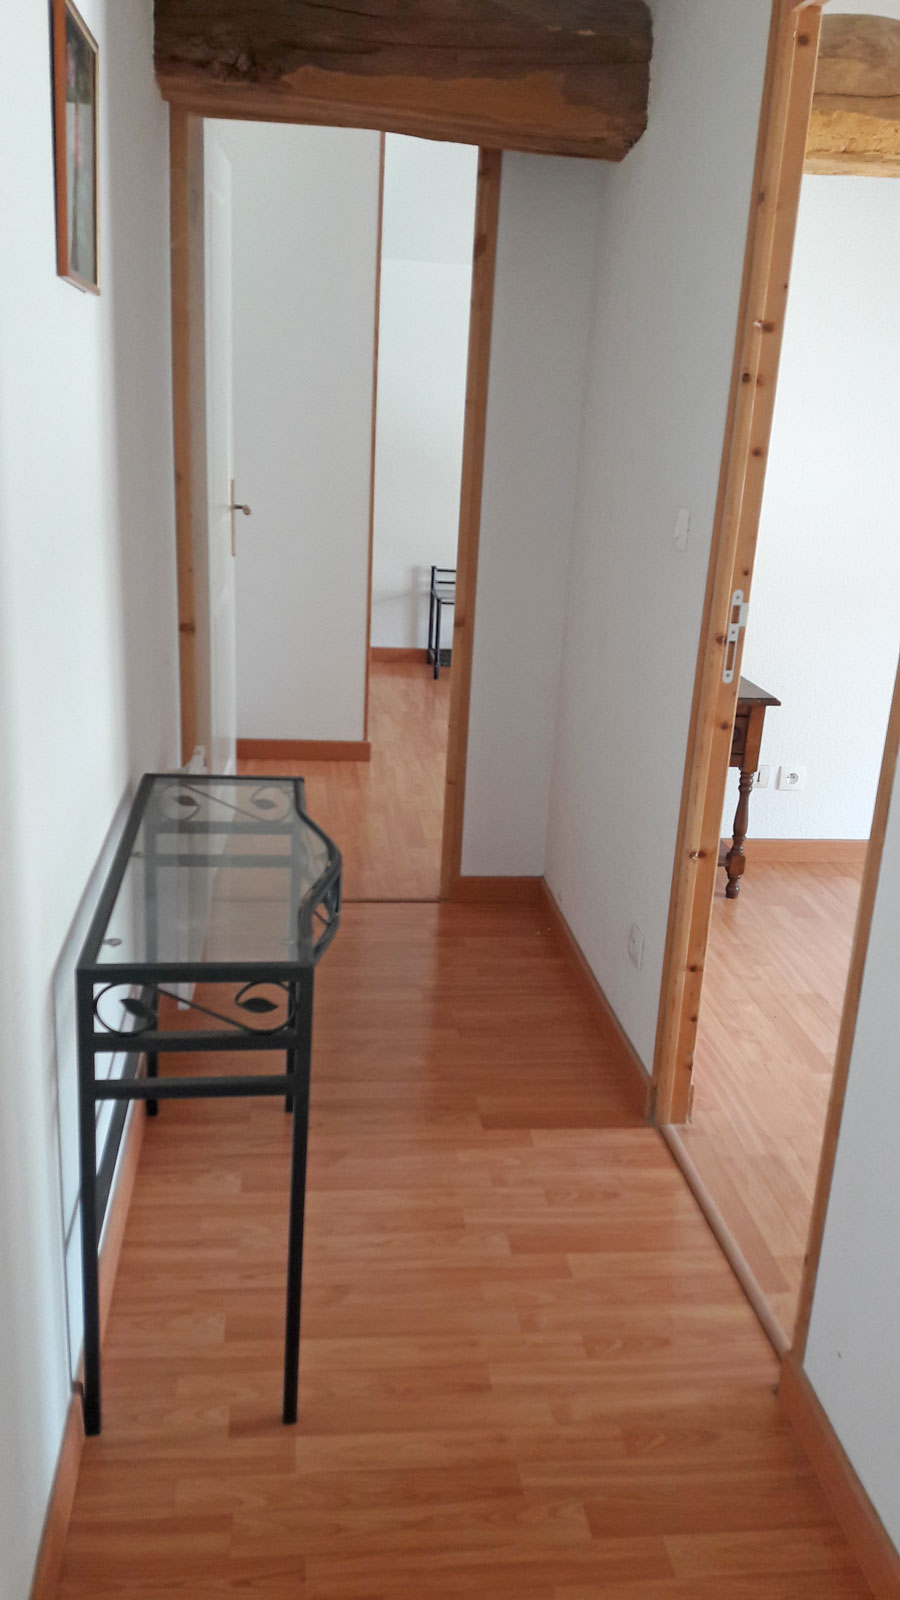 vente appartement THEL 69470 APPARTEMENT T3